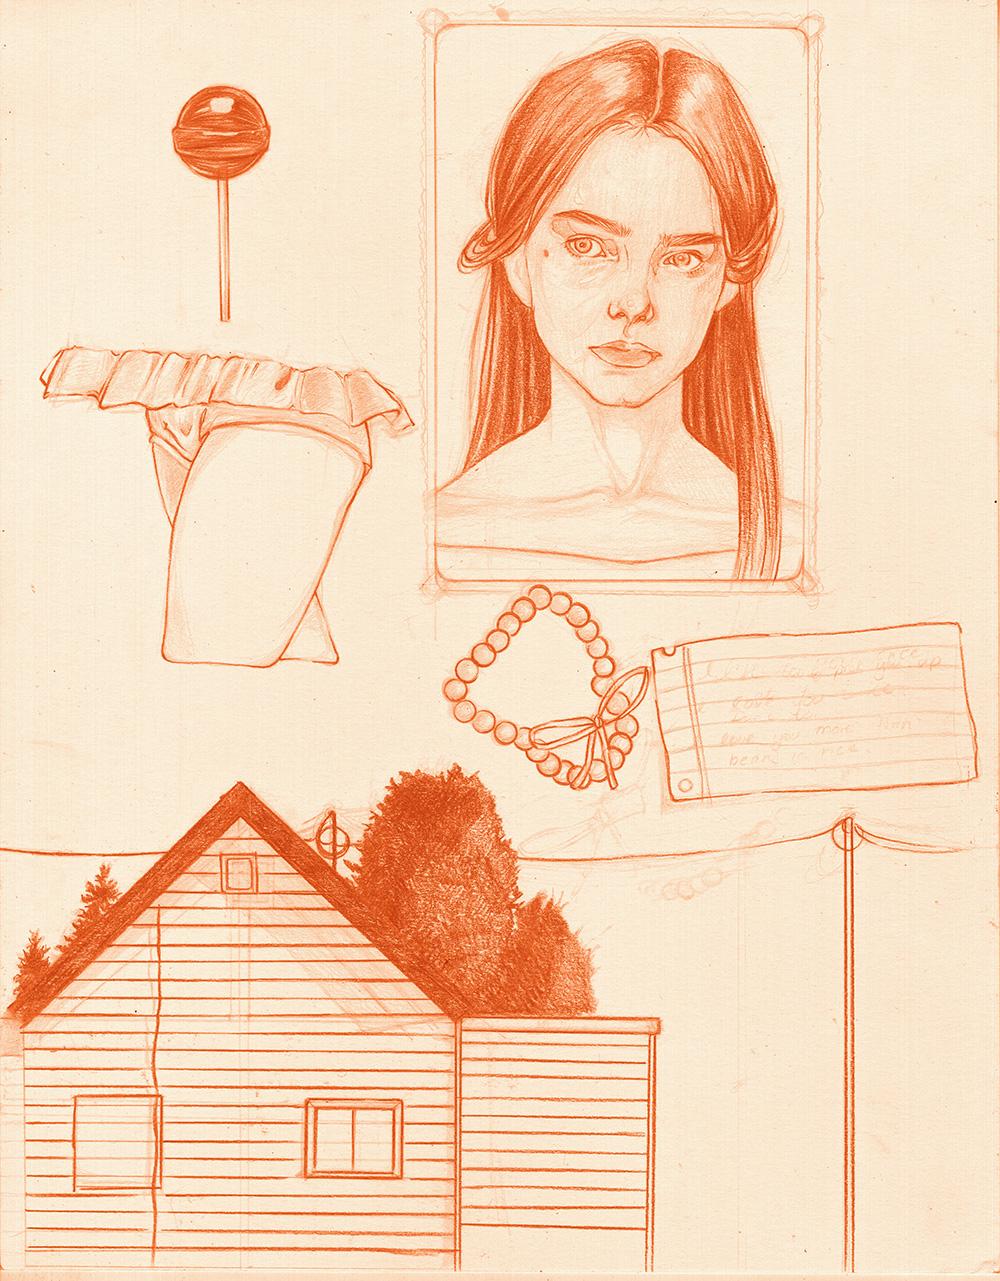 Chang Drawing2_1000pxl.jpg